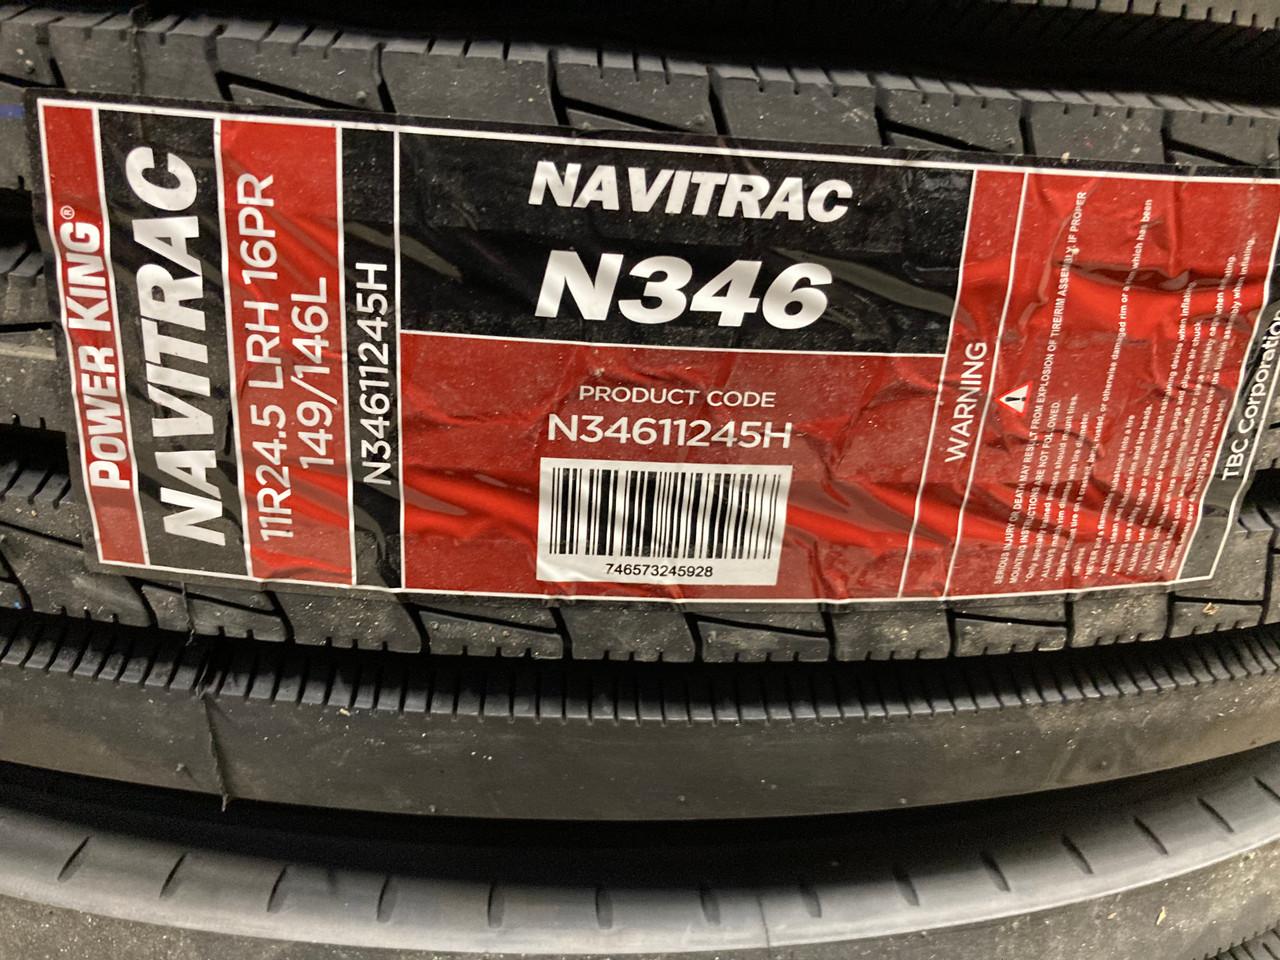 New Tire 295 75 22.5 Power King Navitrac Semi N346 Steer 14 Ply 295/75R22.5